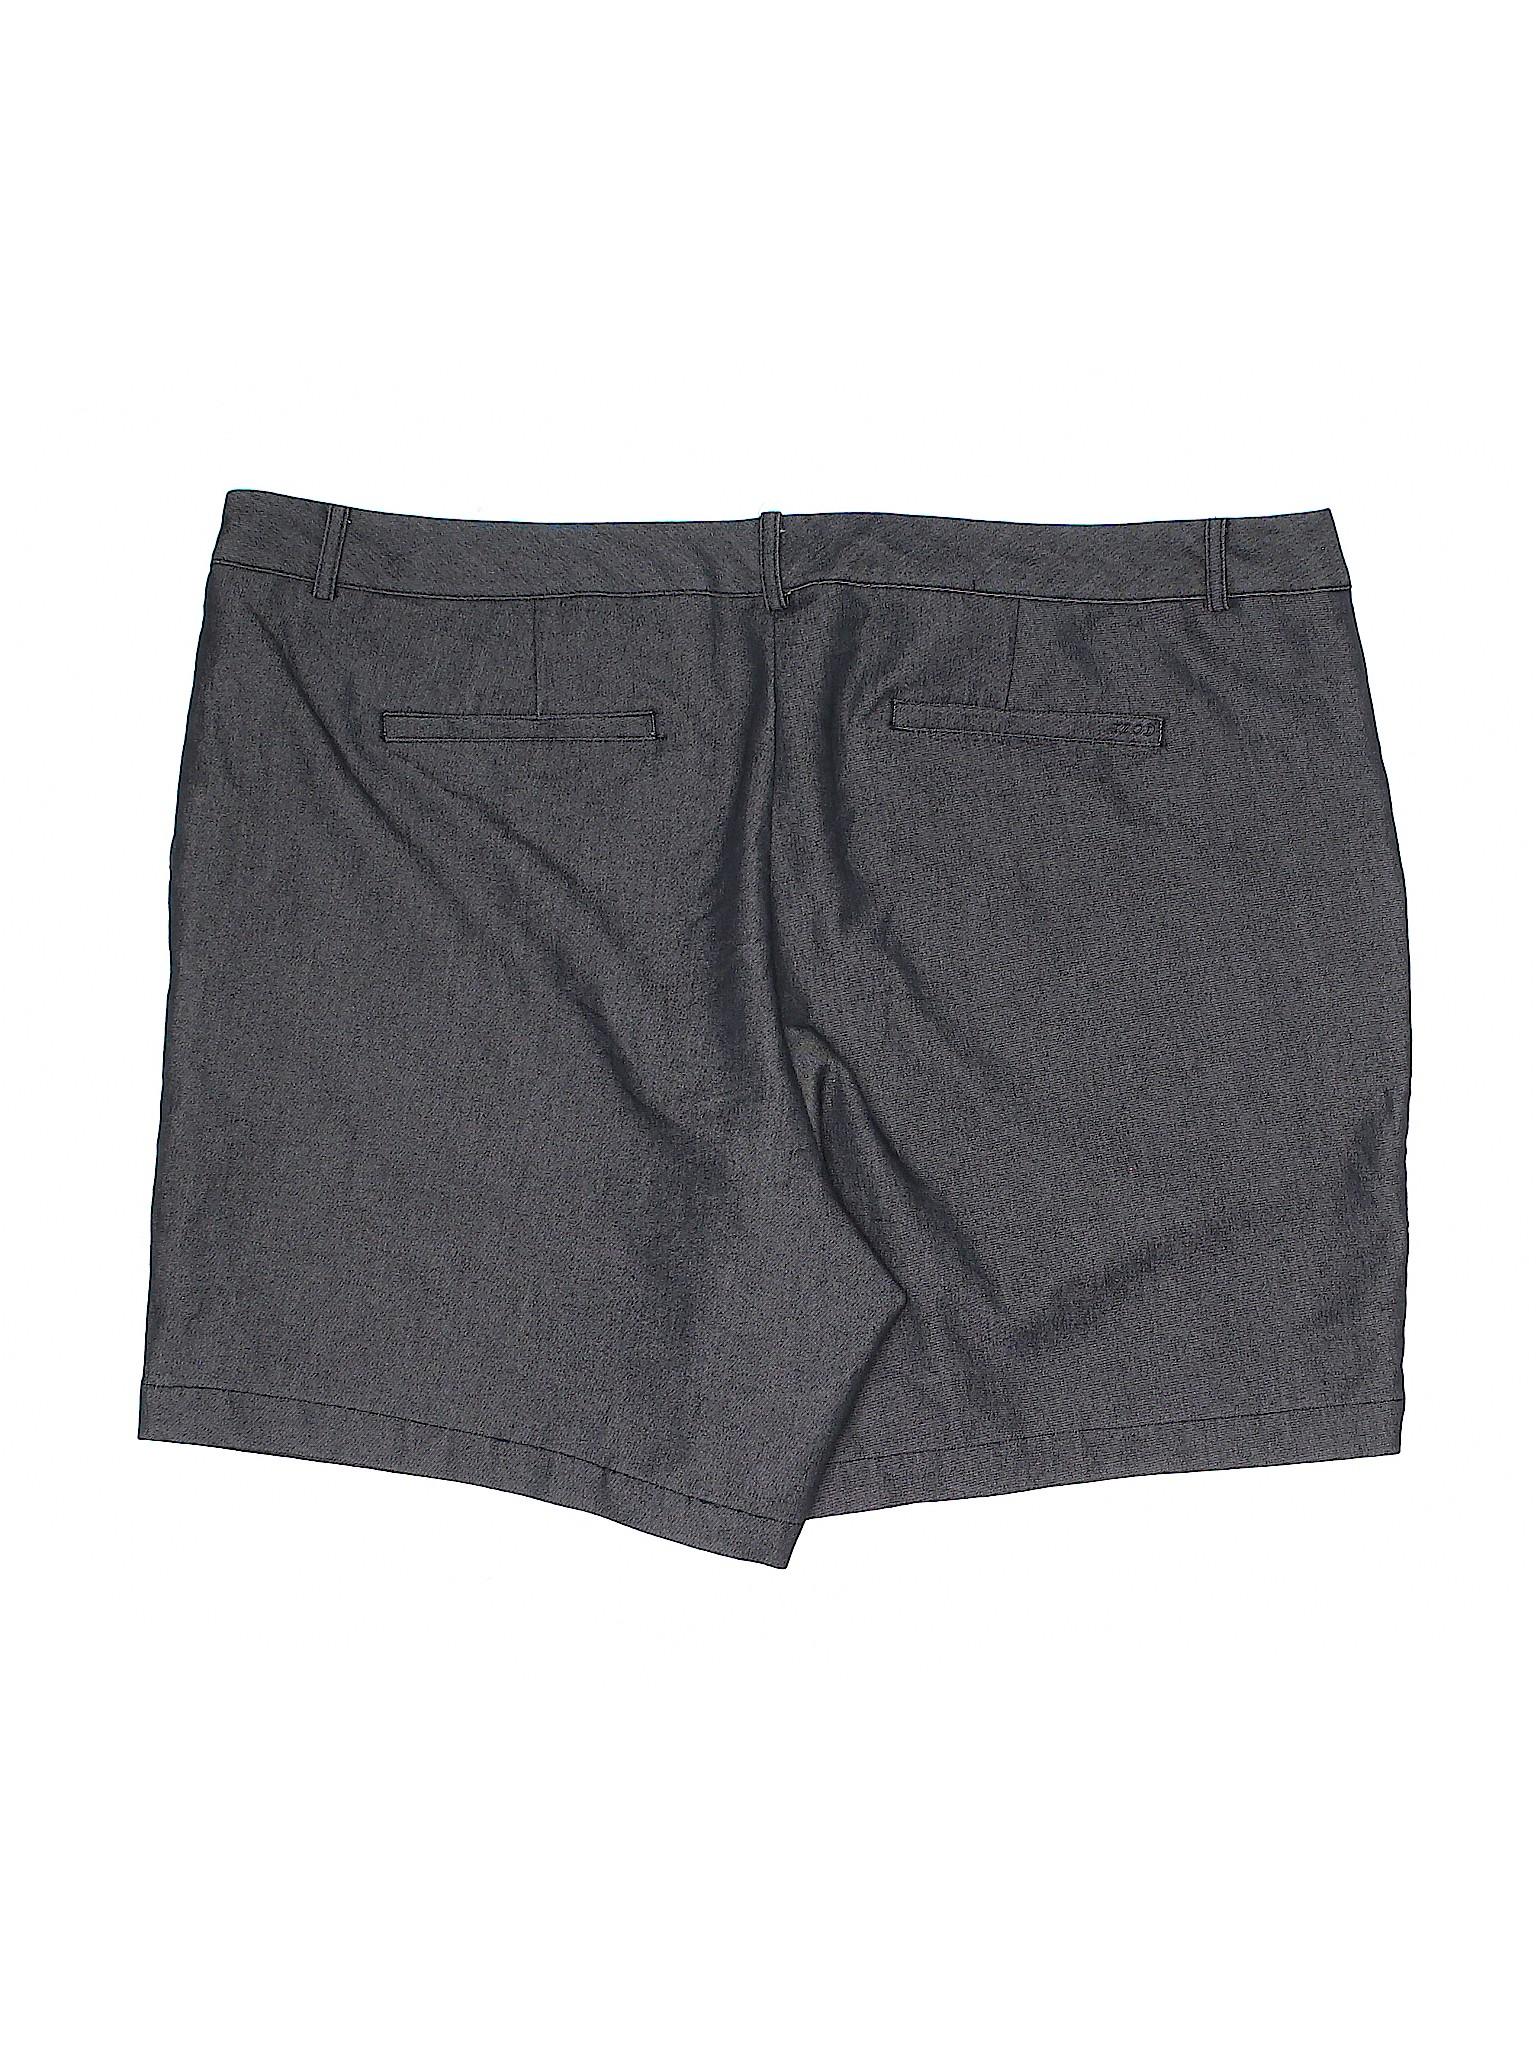 Boutique IZOD Shorts Shorts Boutique Shorts IZOD IZOD Boutique Khaki Khaki Khaki IZOD Khaki Boutique xYqzCnX5Rw